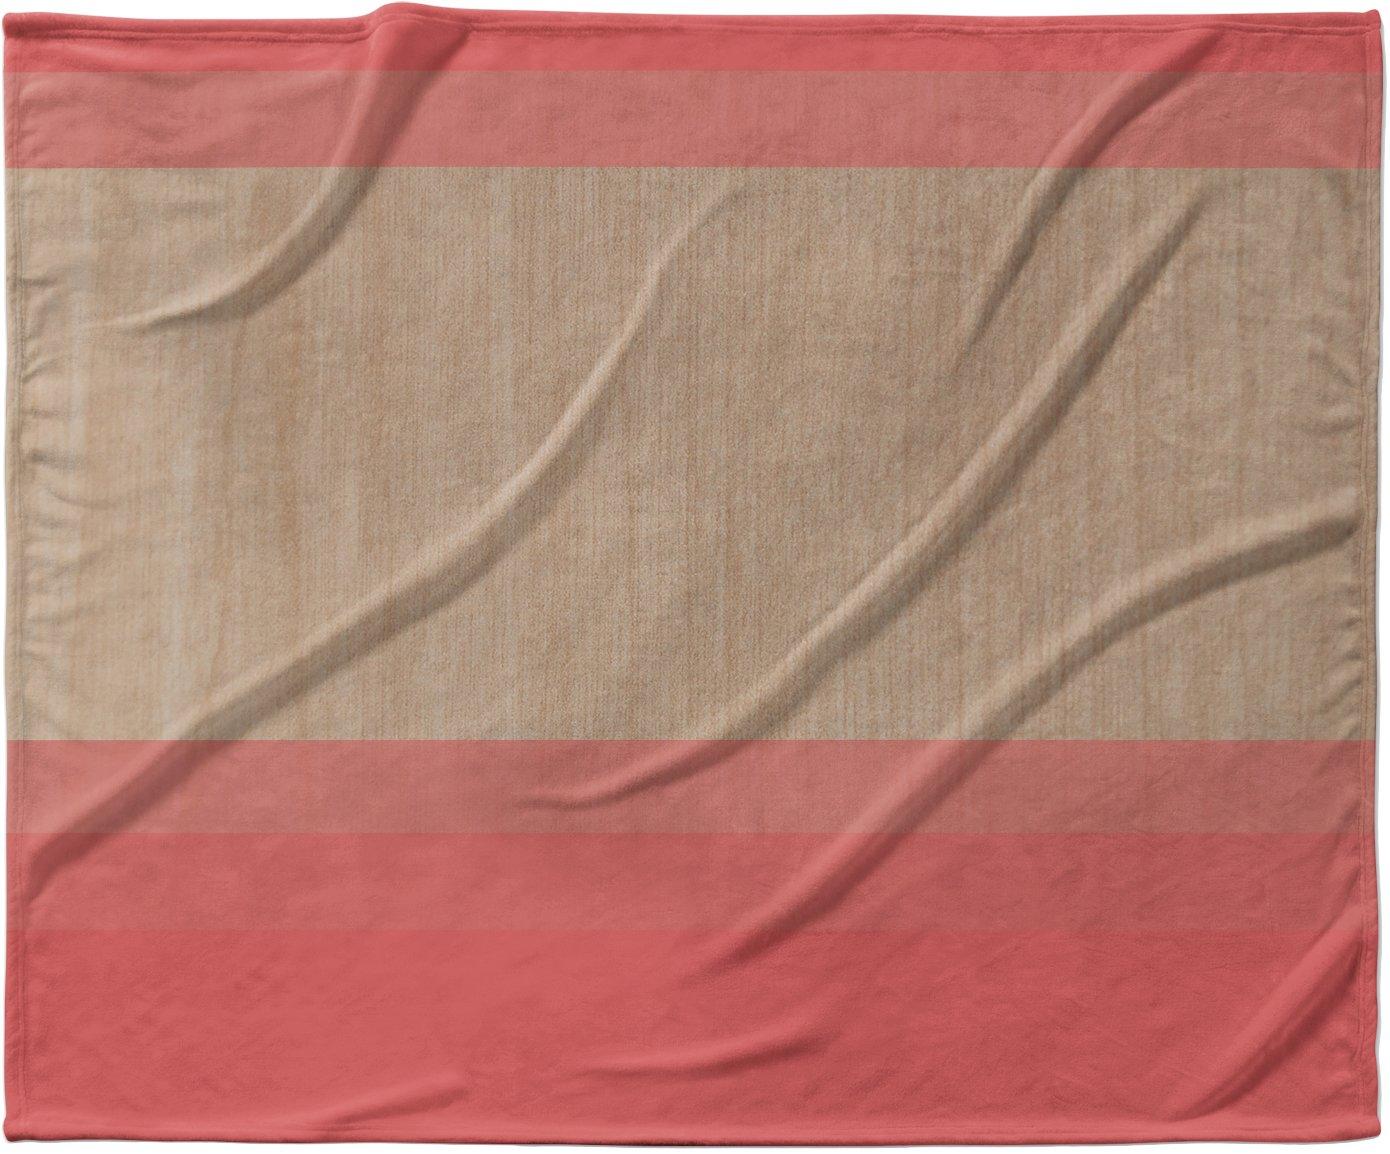 KESS InHouse Brittany Guarino ''Art Red'' Pink Wood Fleece Baby Blanket, 40'' x 30''